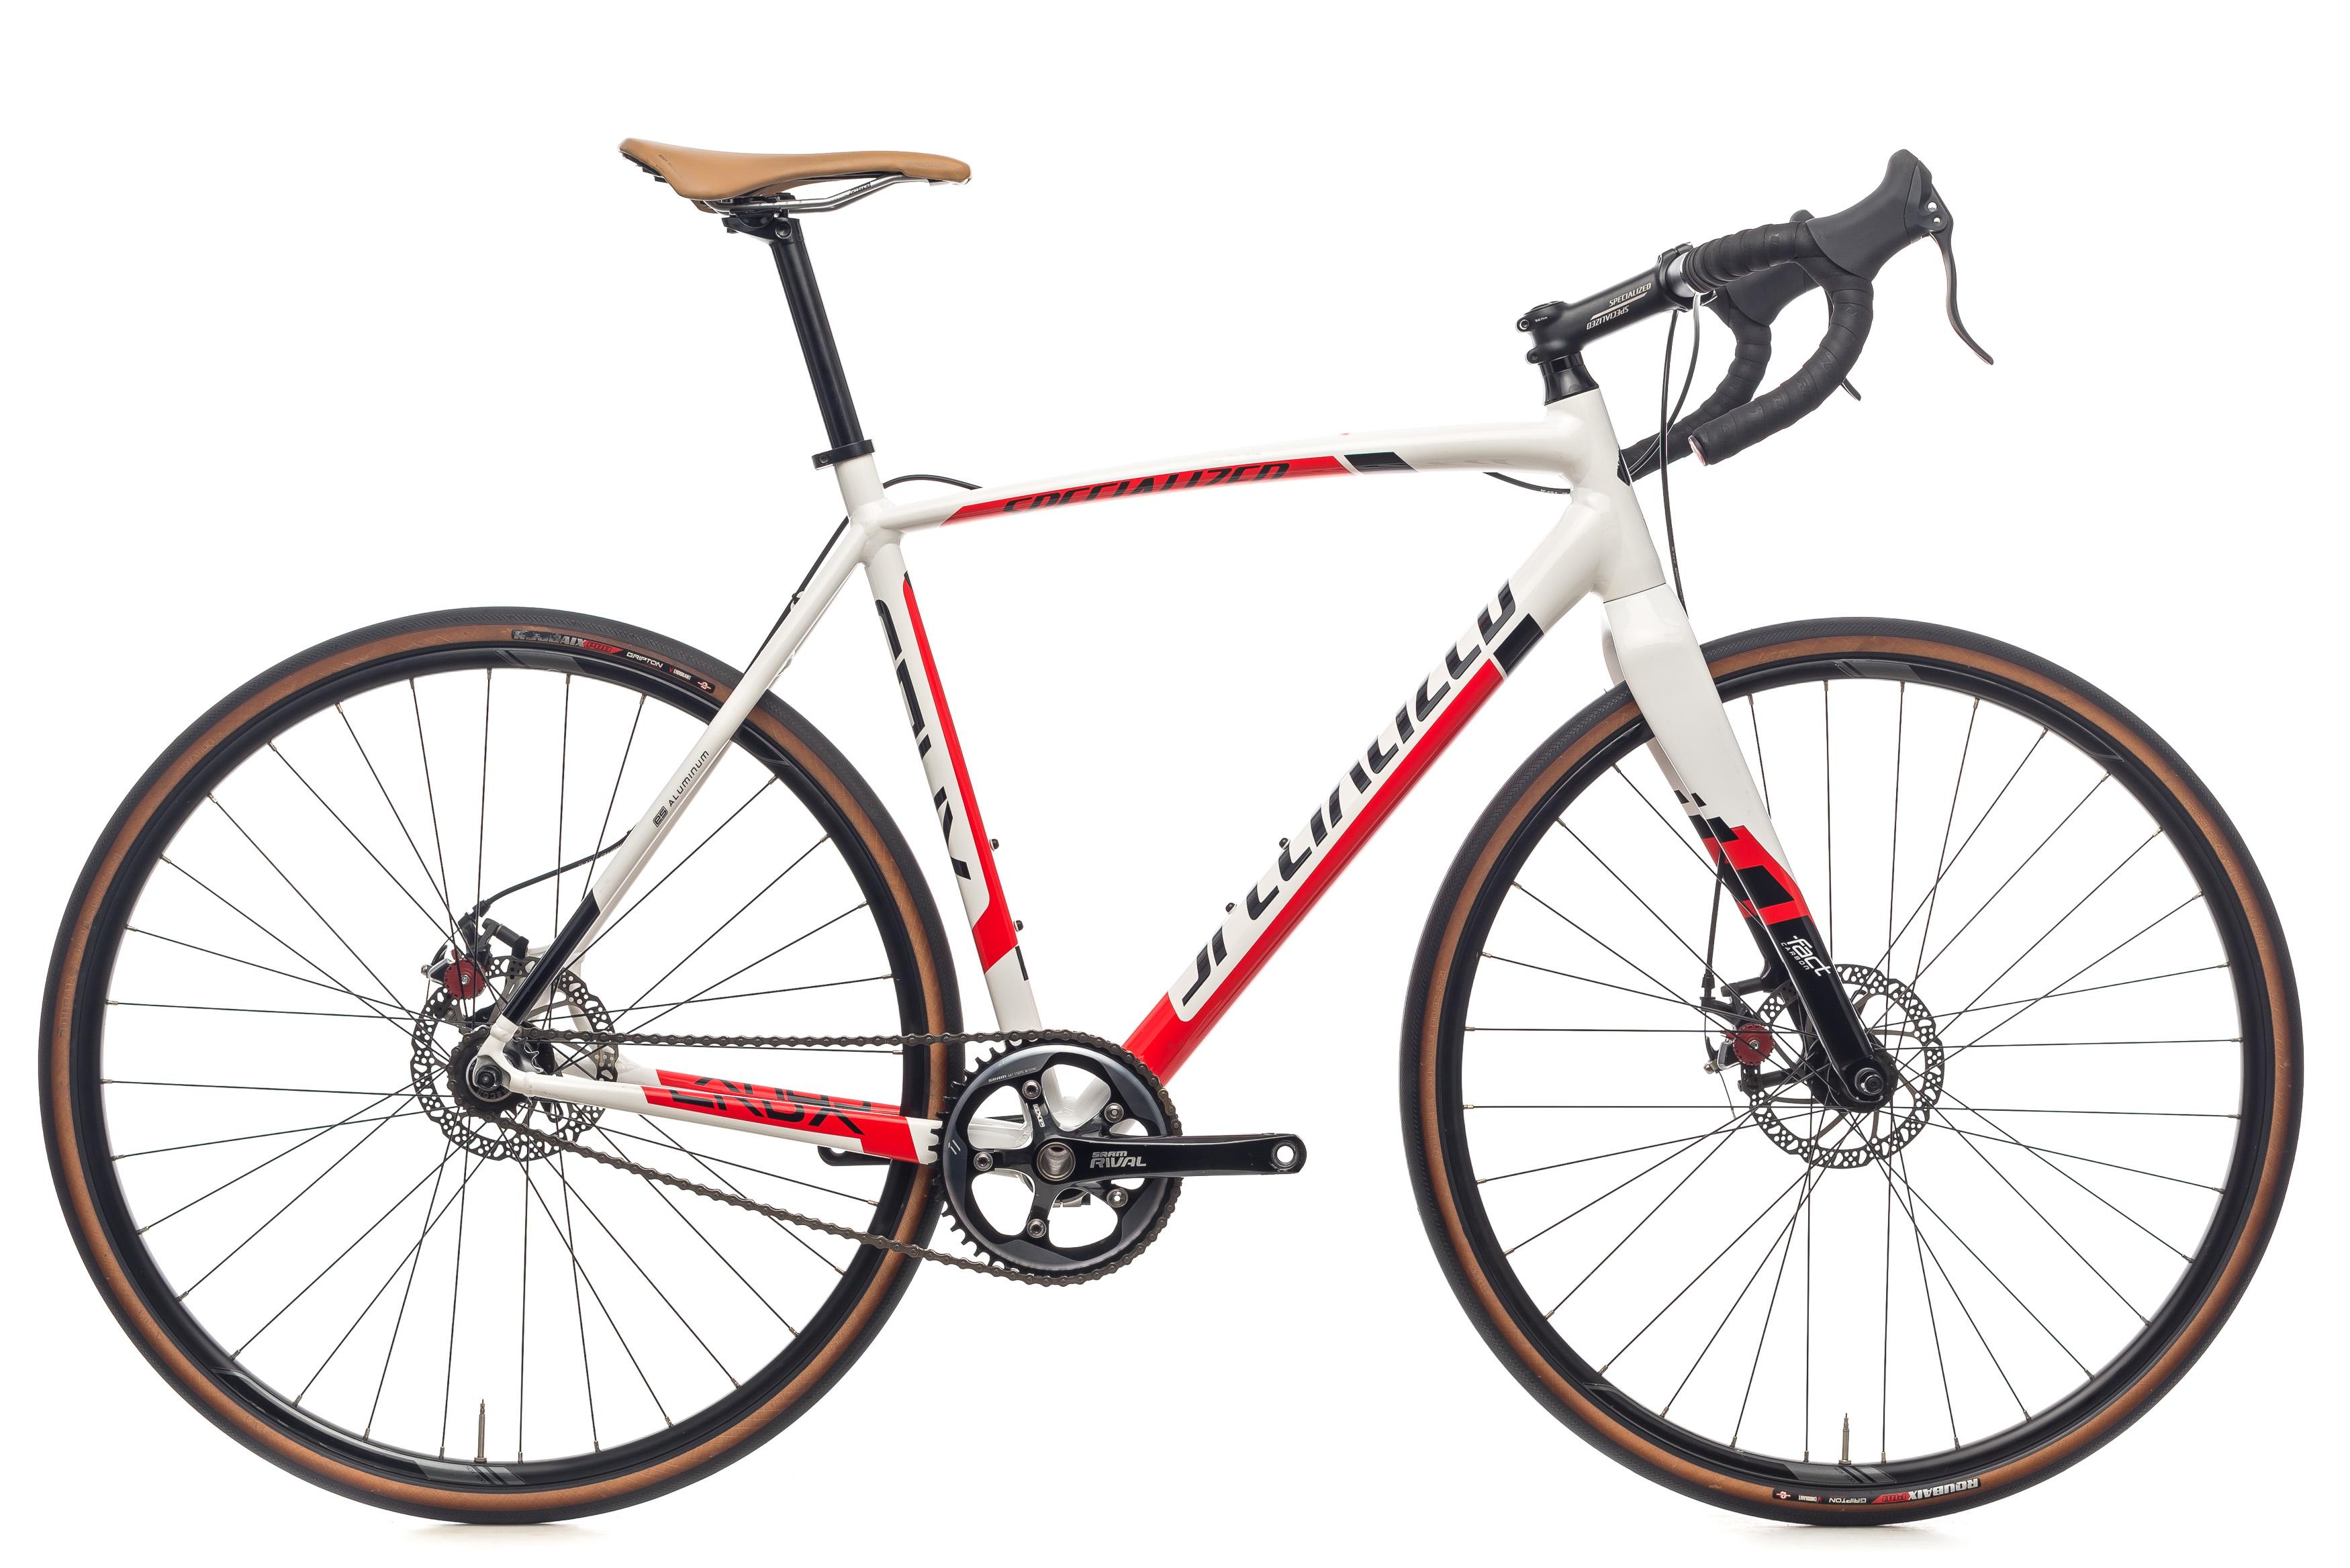 Cyclocross singlespeed disc brakes